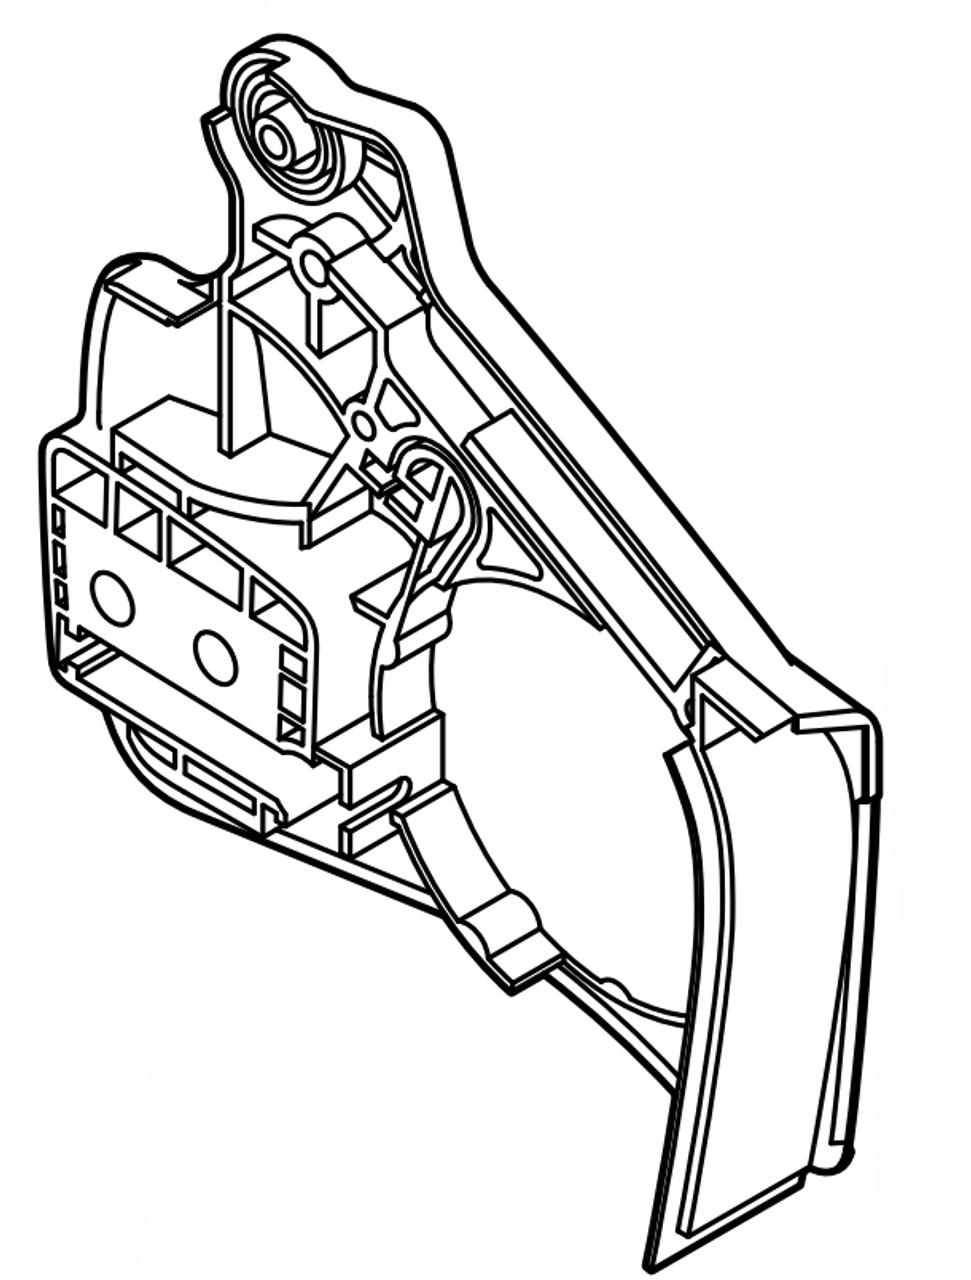 Echo CS-350TES, CS-361P Clutch Cover, New Oem C300000242